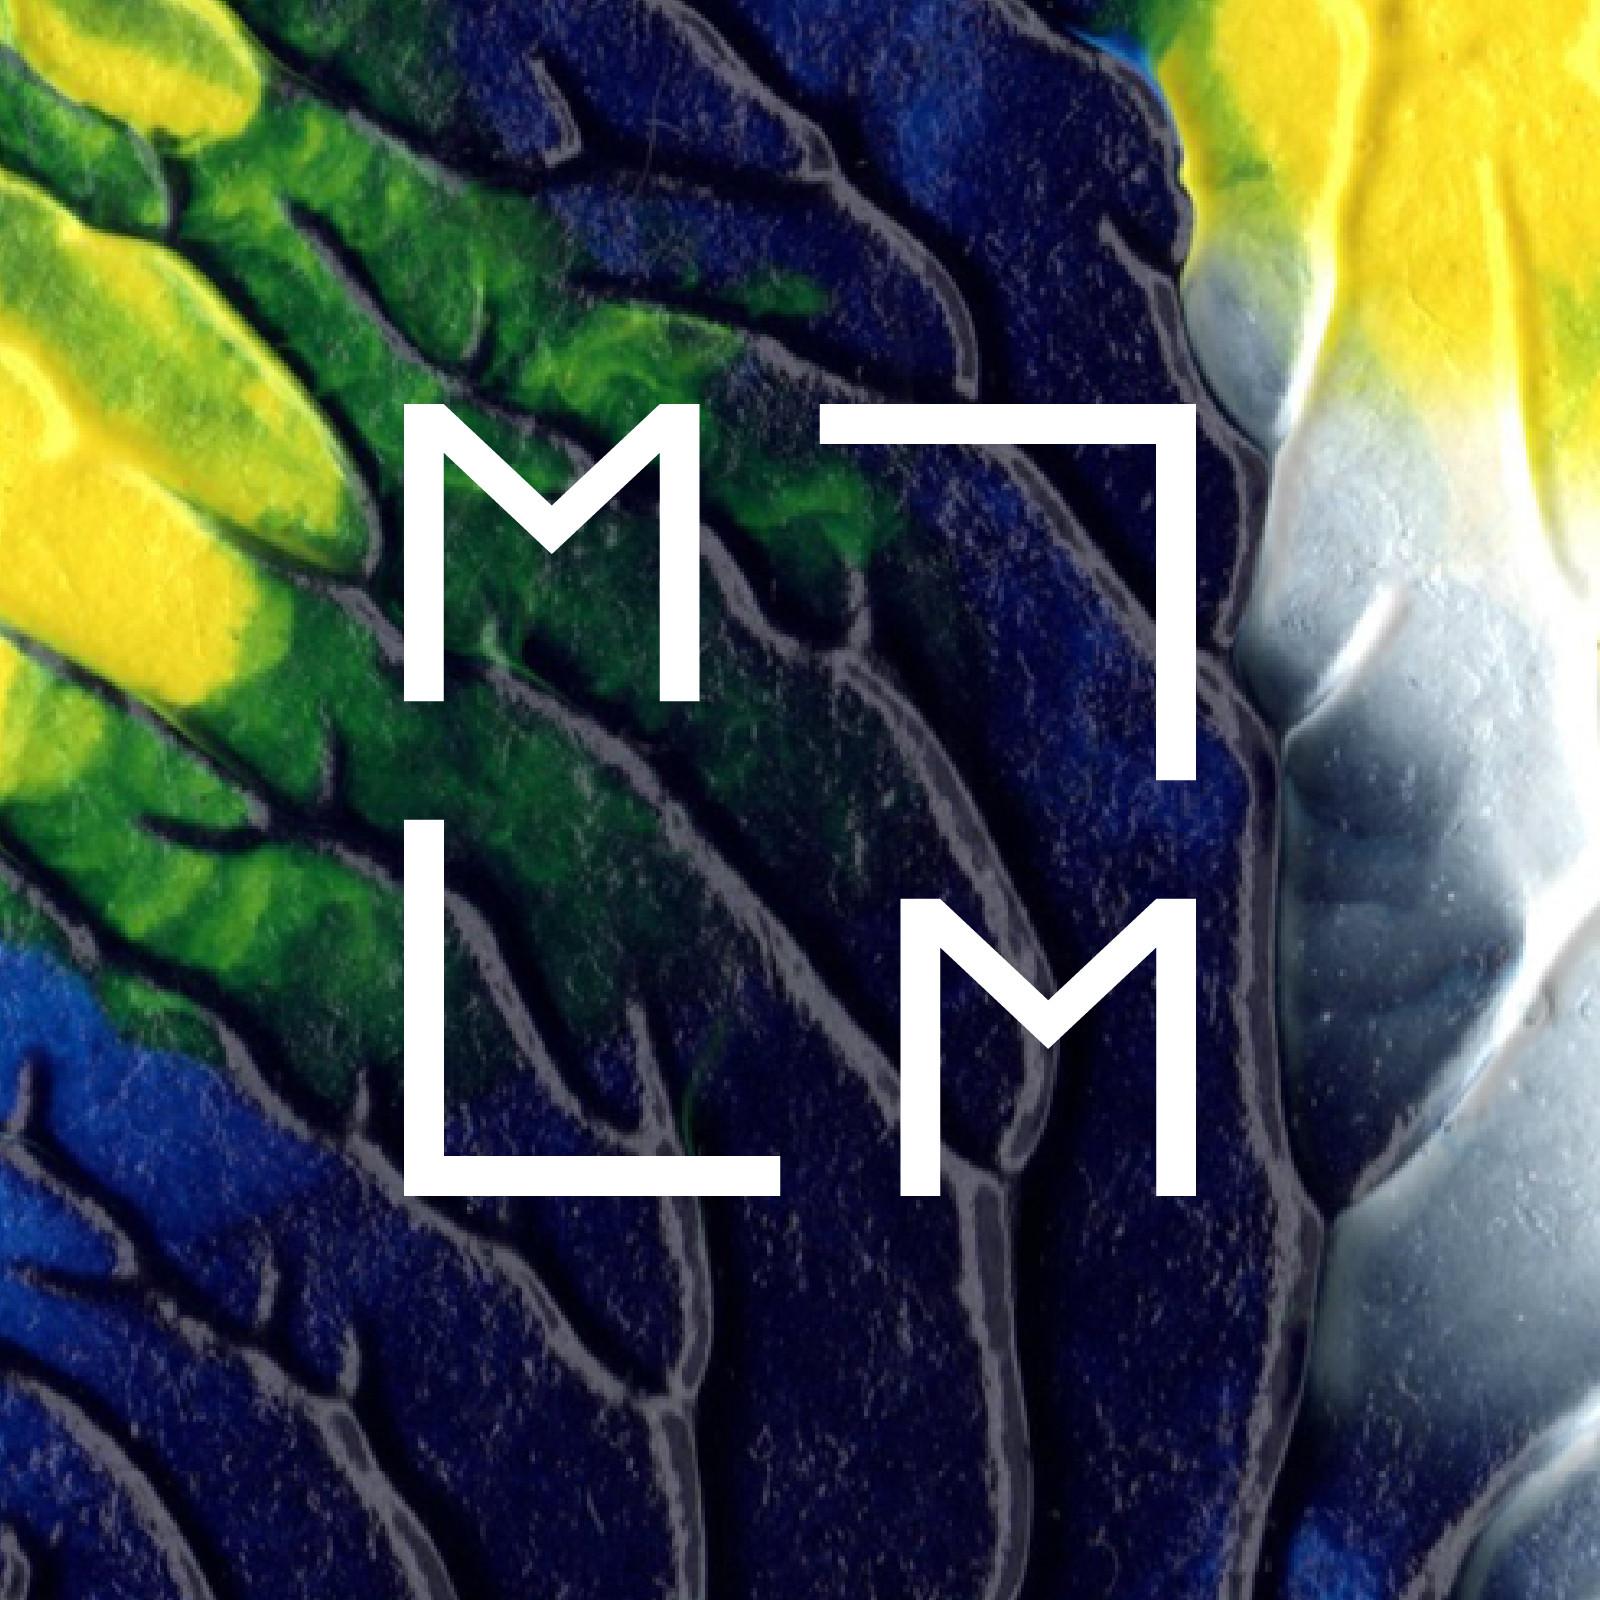 MEDIUM AND MORE